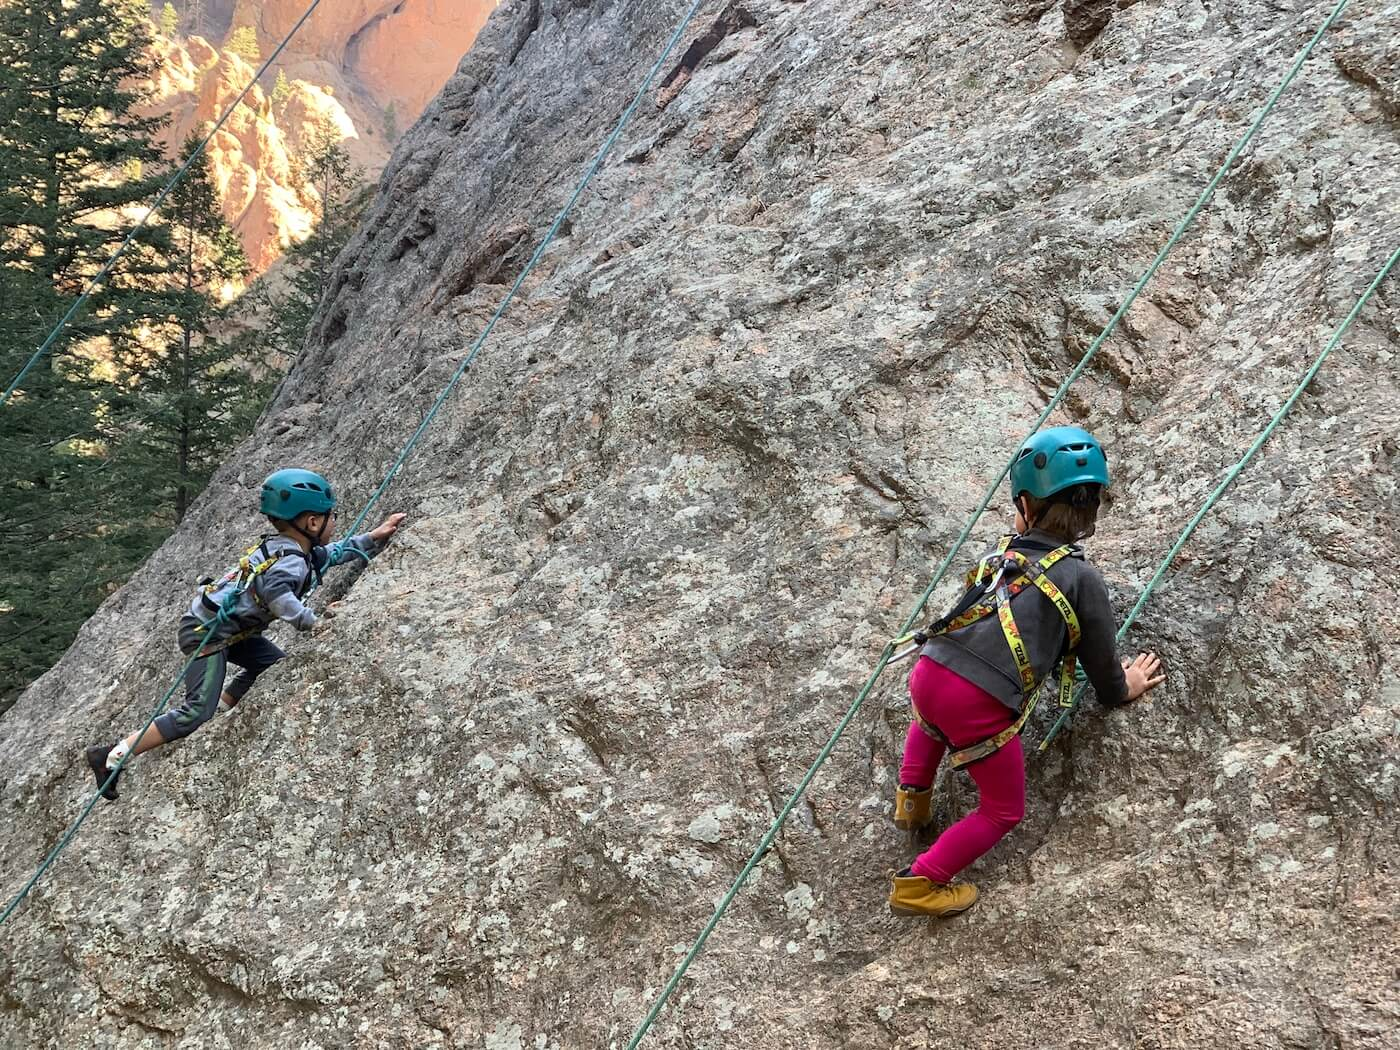 rock climbing classes for children in Colorado Springs